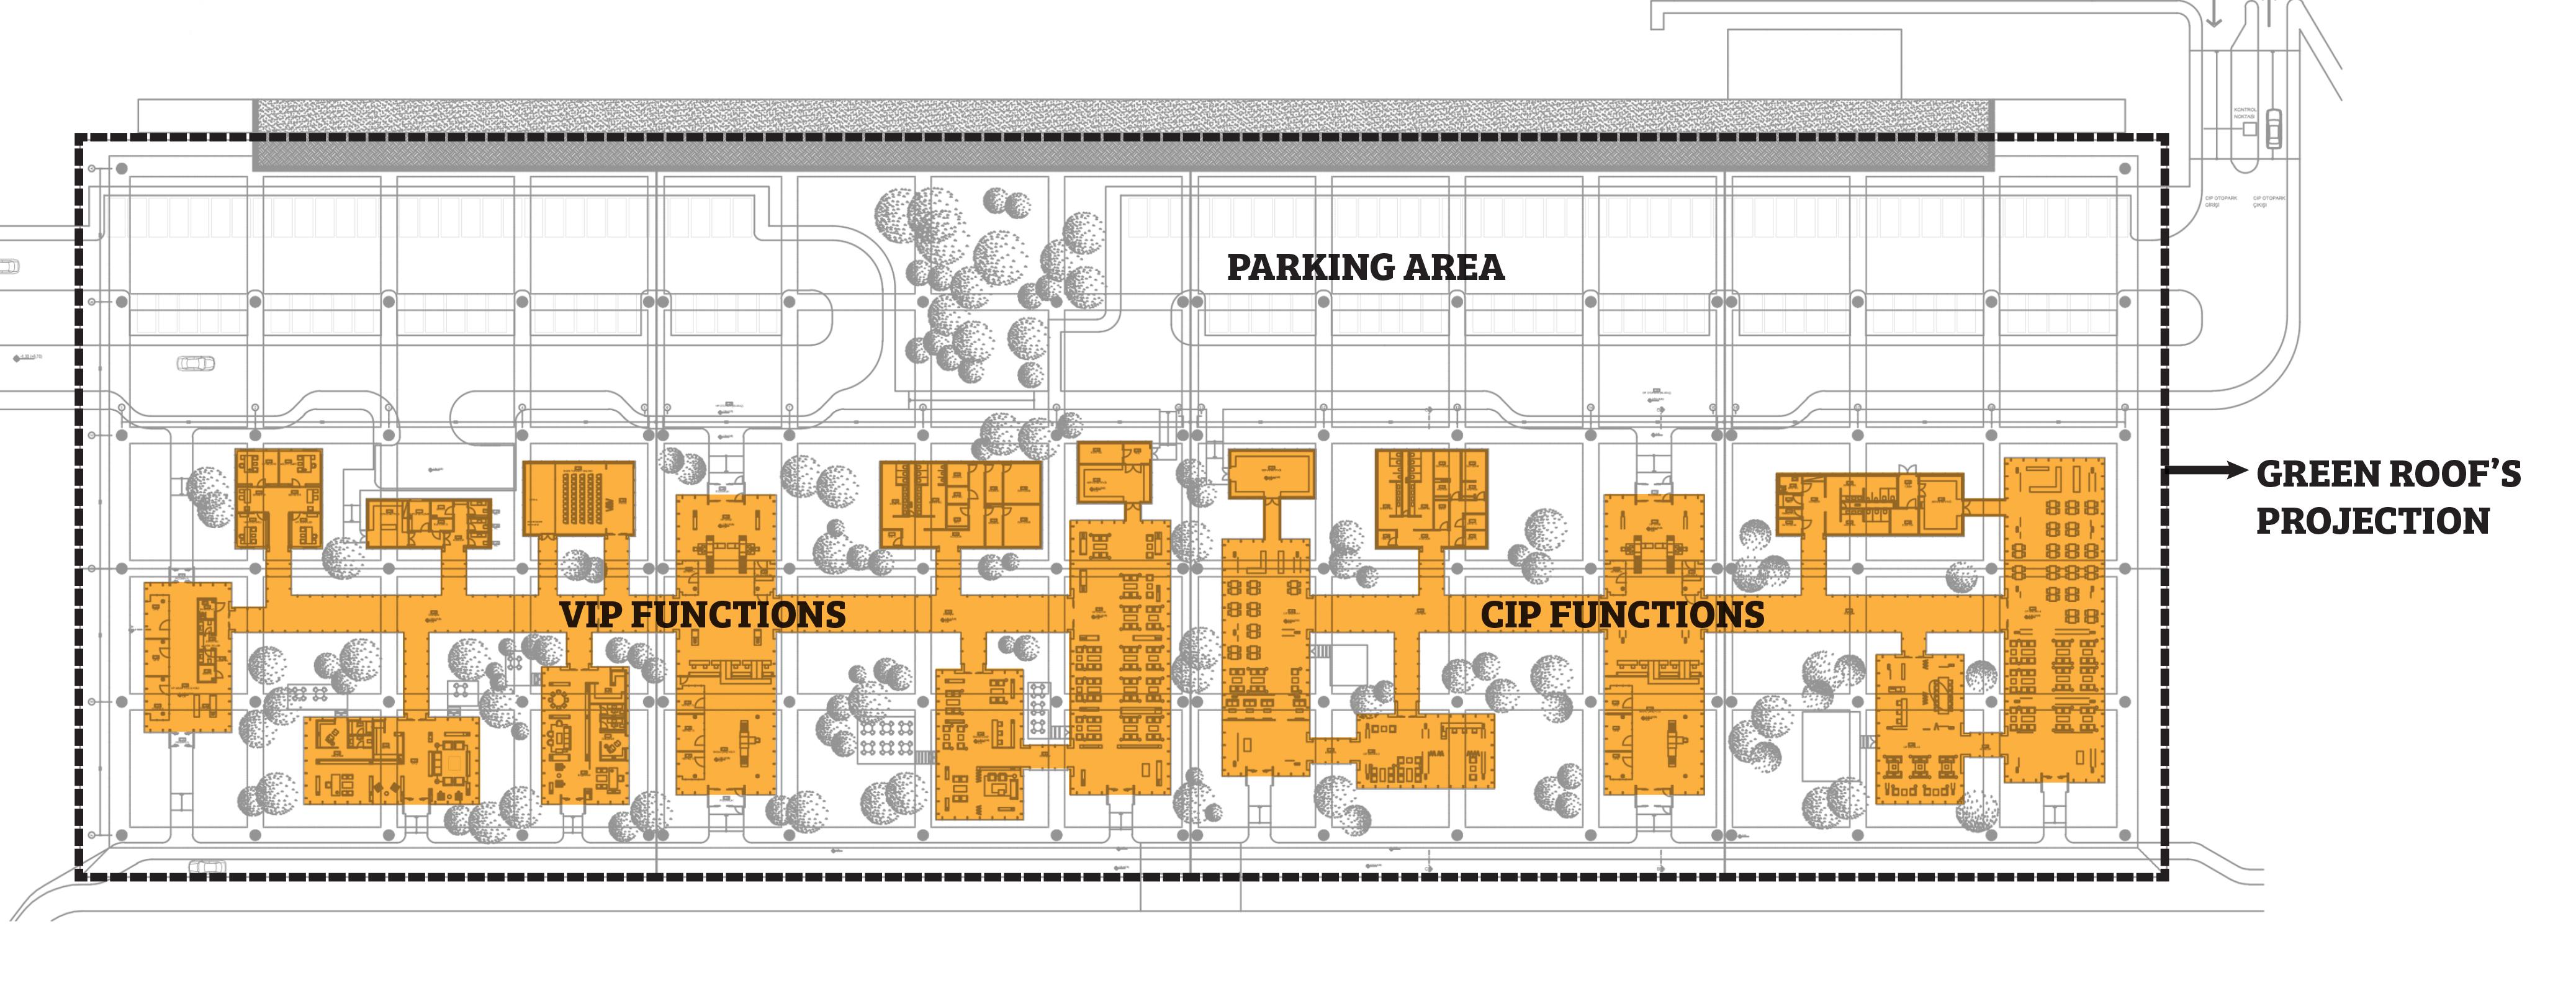 Cukurova Regional Airport Roof Design Decision Support